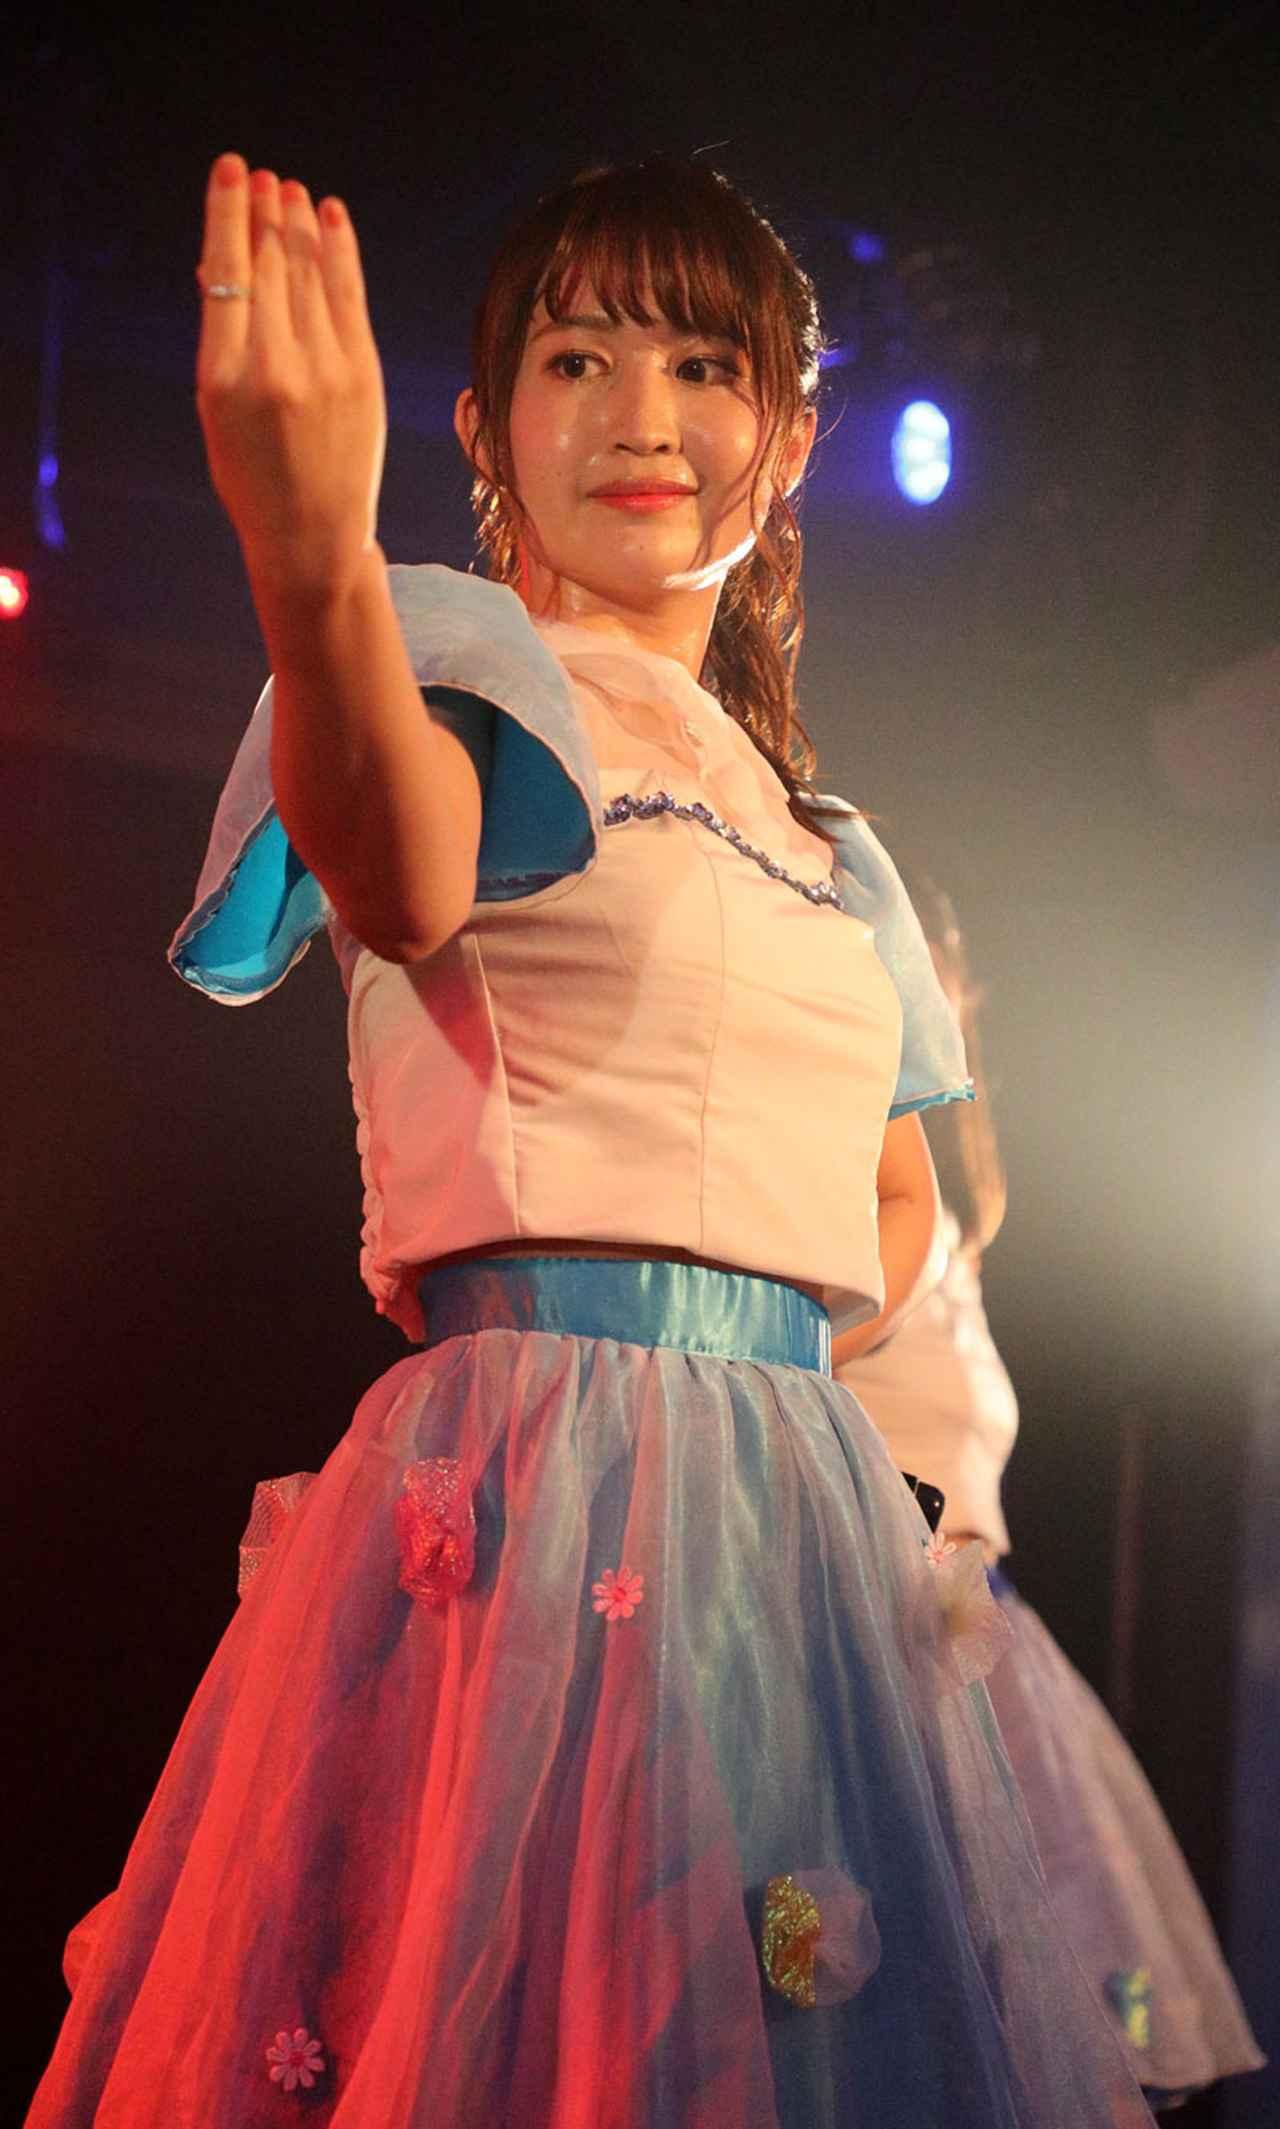 Images : 17番目の画像 - 「dela/ミスマガジングランプリ受賞者・沢口愛華を含む名古屋の人気アイドル・グループが、定例東京公演を開催。切れ味鋭いダンス、多彩な楽曲でファンを魅了」のアルバム - Stereo Sound ONLINE